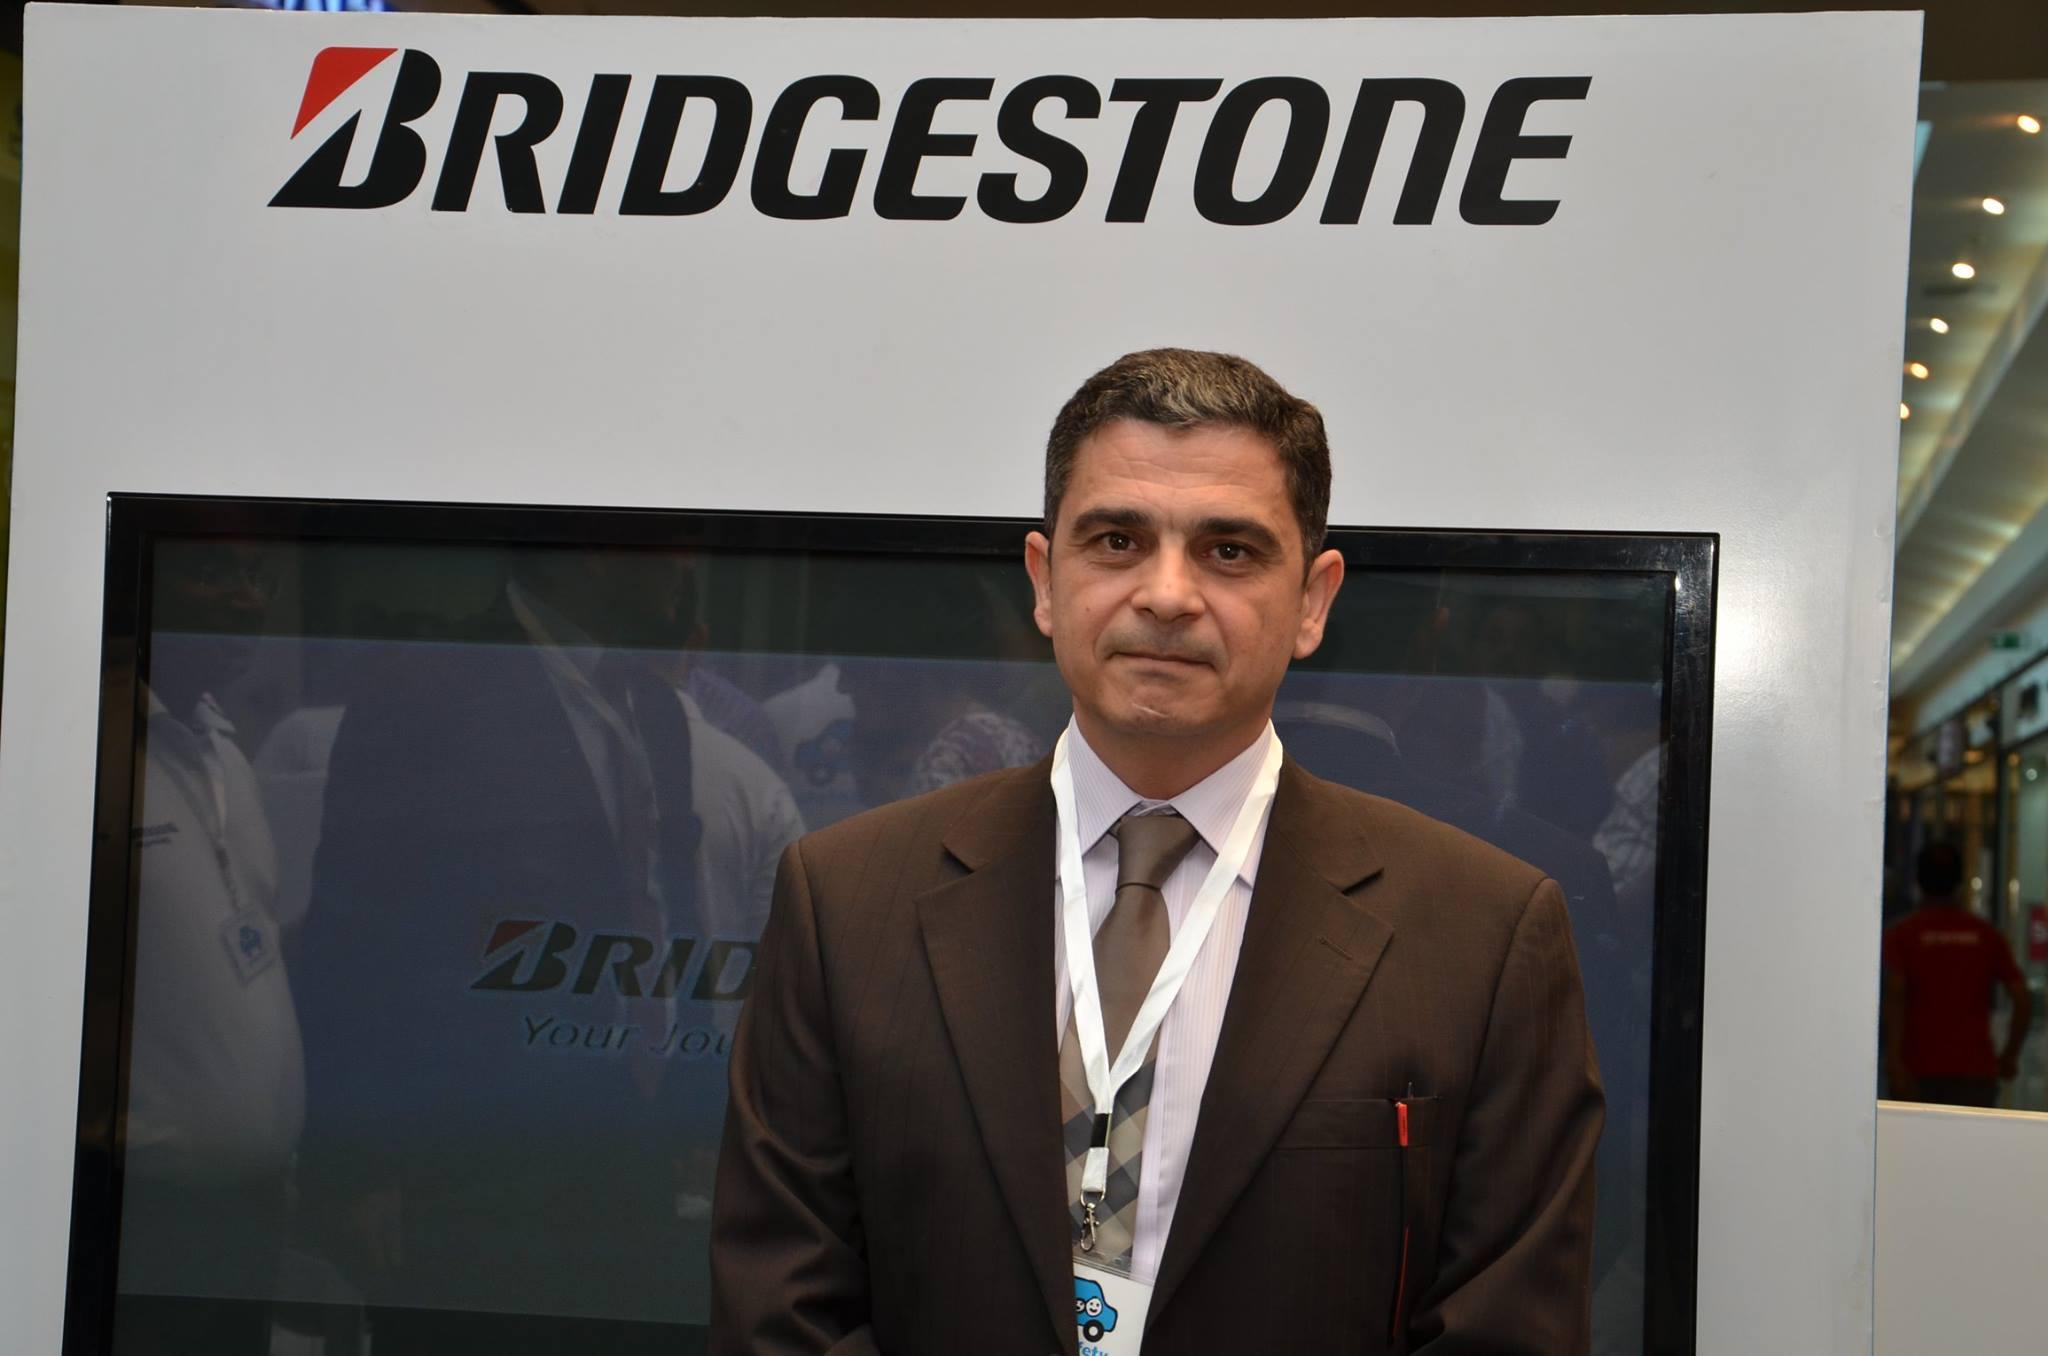 Ahmed Yehia, Bridgestone's North Arab & Africa Branch General Manager Hassan Abdel Meguid, Head of the EOS (Photo handout from Bridgestone)